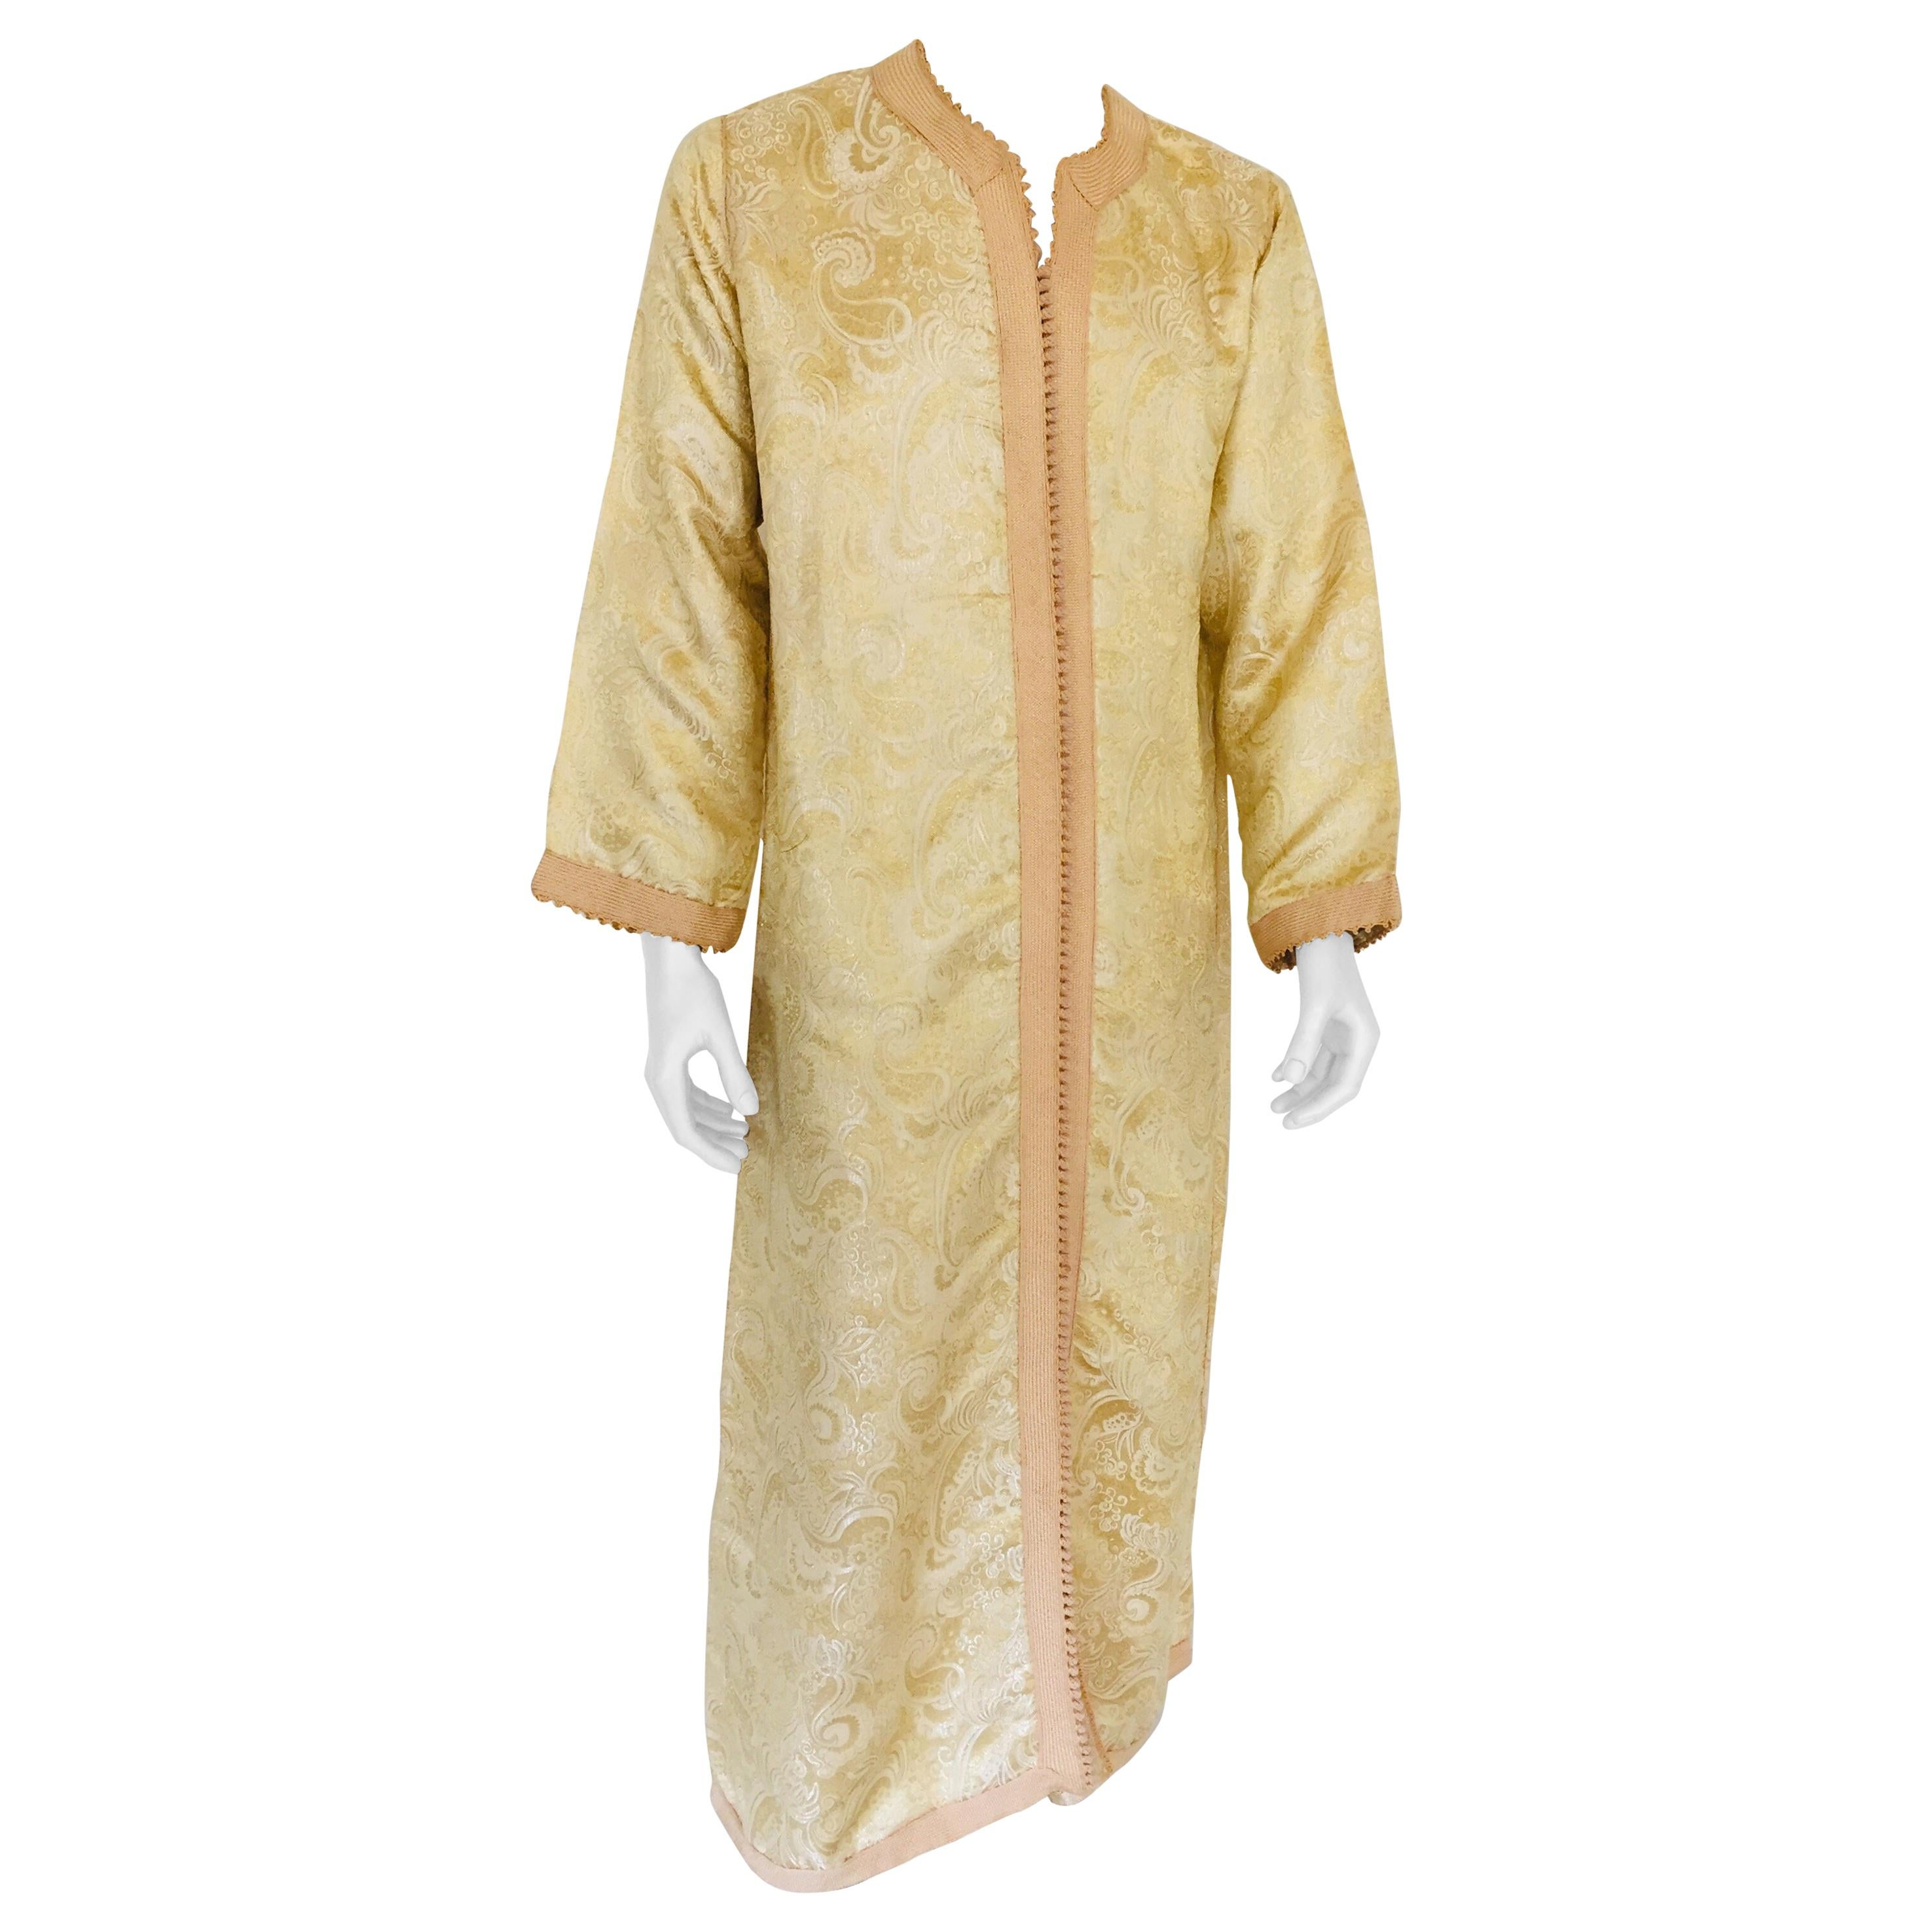 Metallic Gold and Silver Brocade 1970s Maxi Dress Caftan, Evening Gown Kaftan